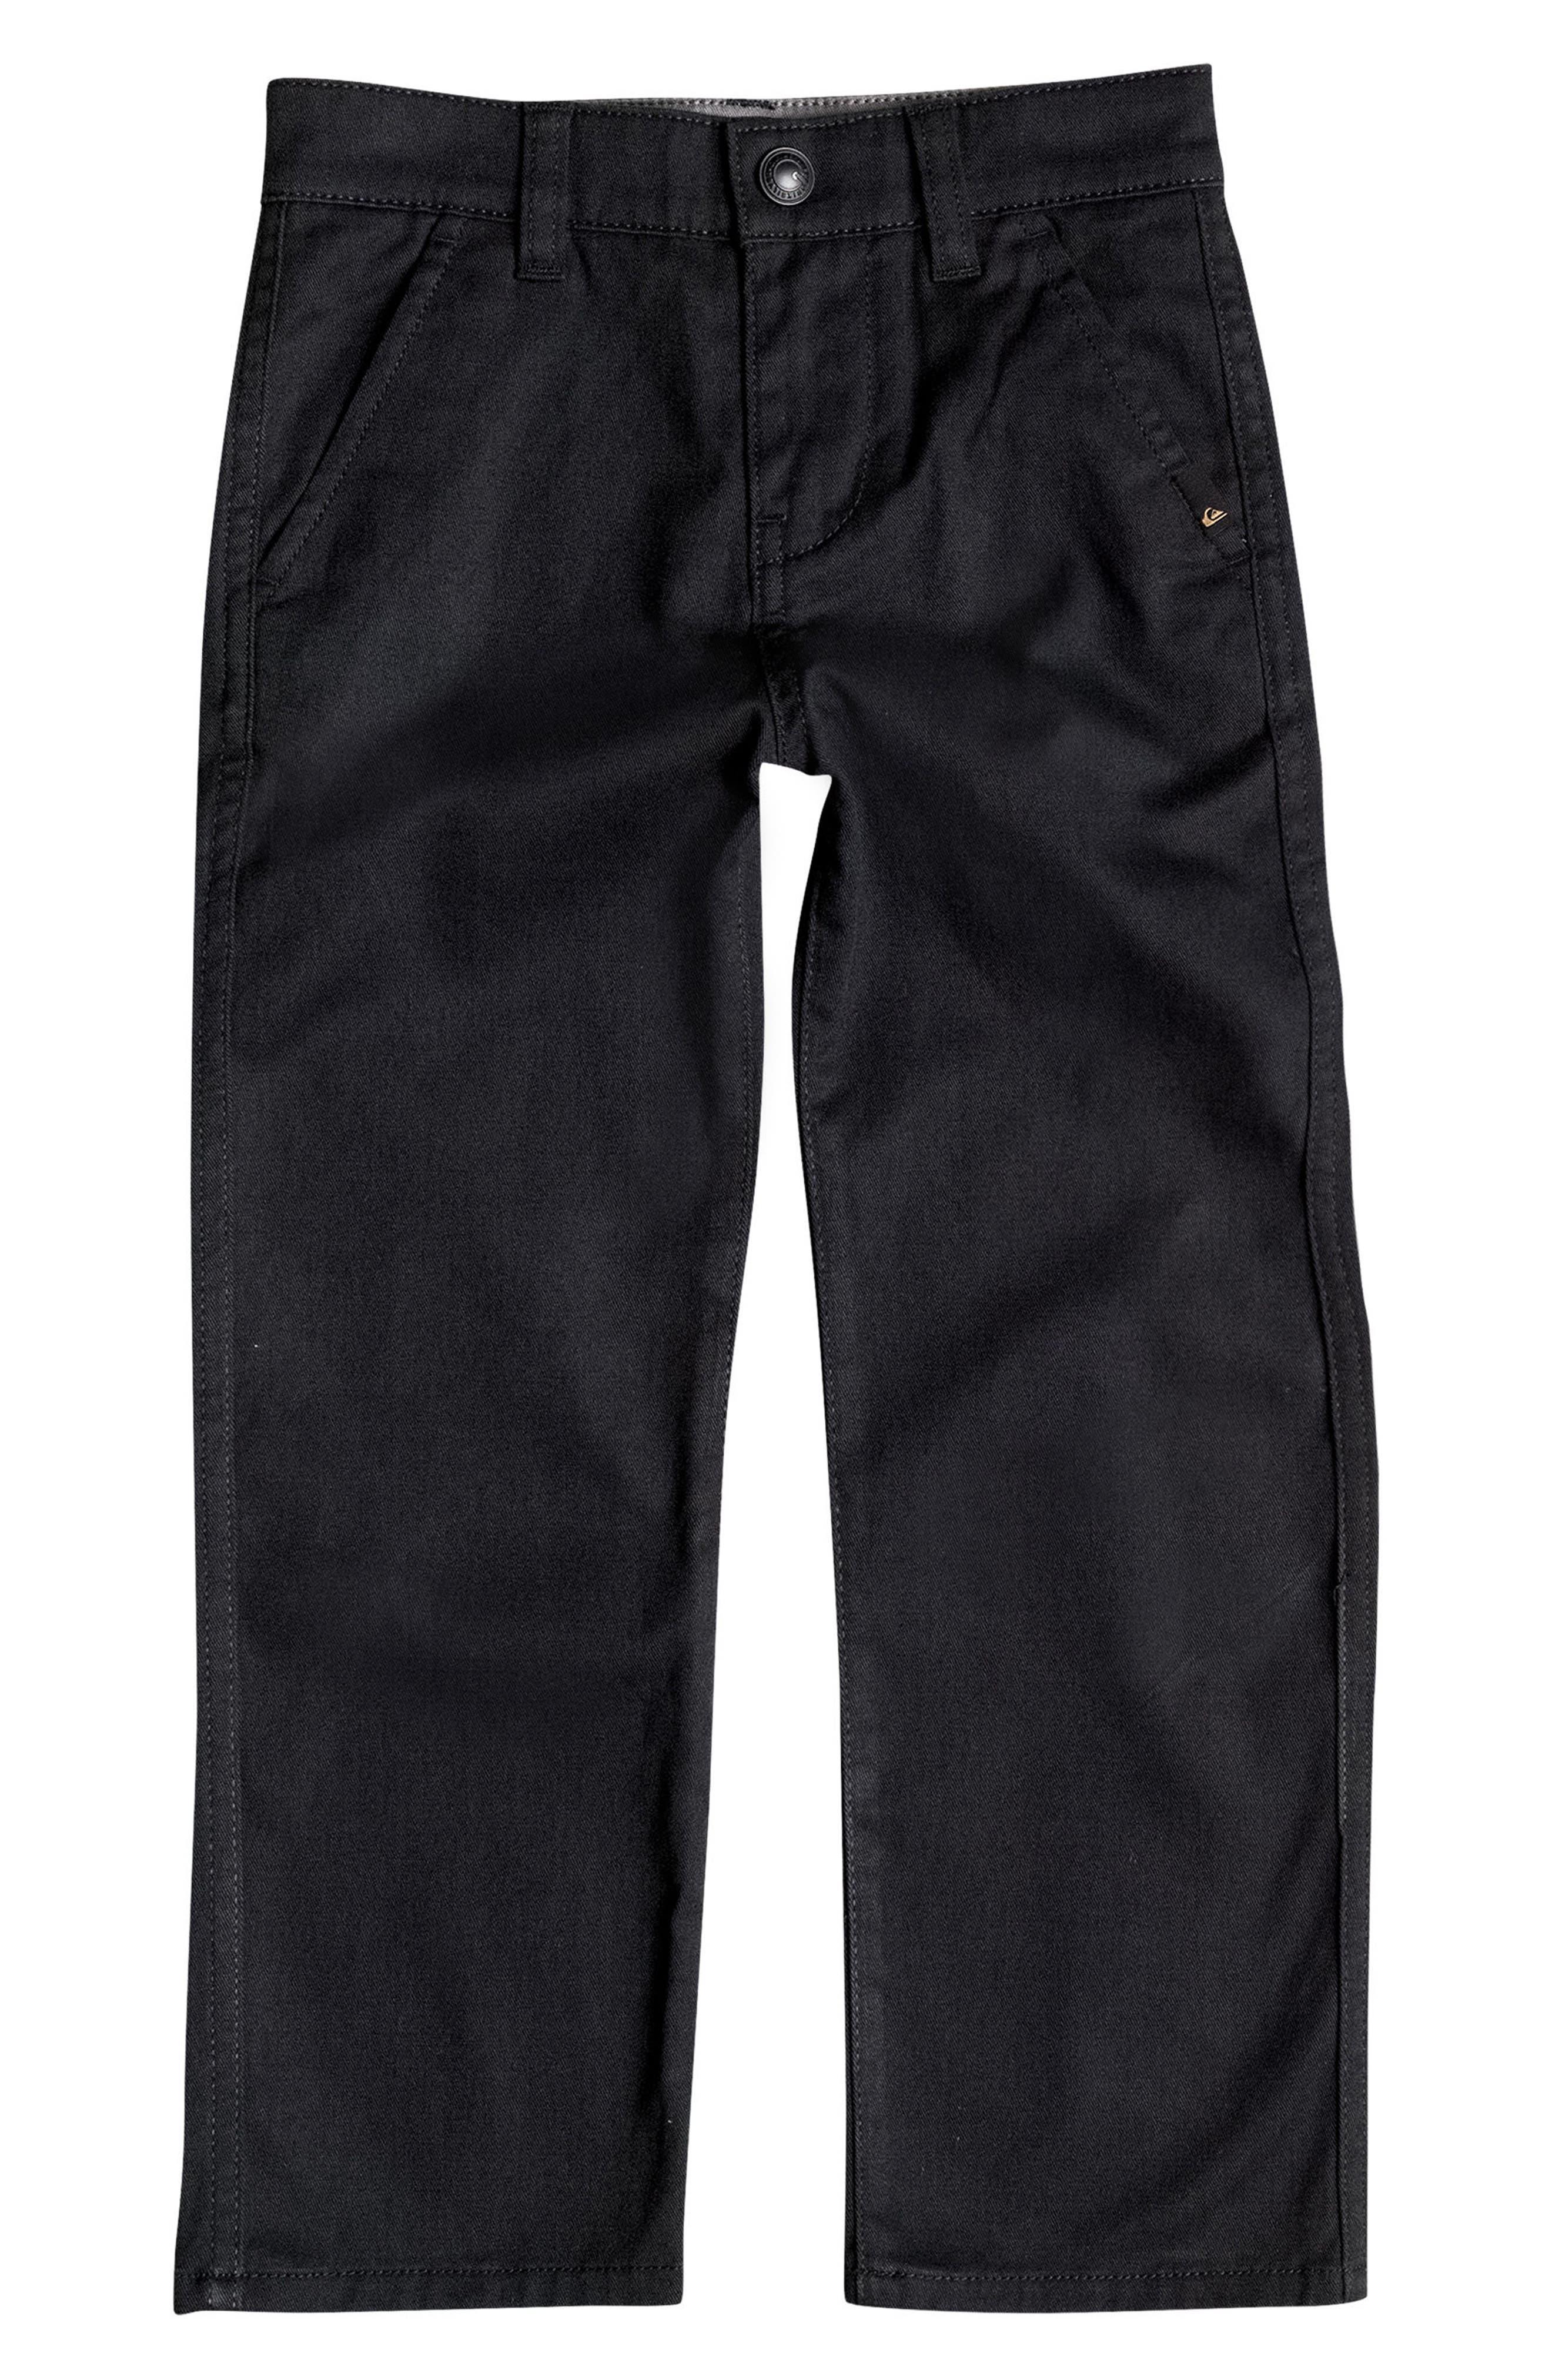 Everyday Union Pants,                             Main thumbnail 1, color,                             Black